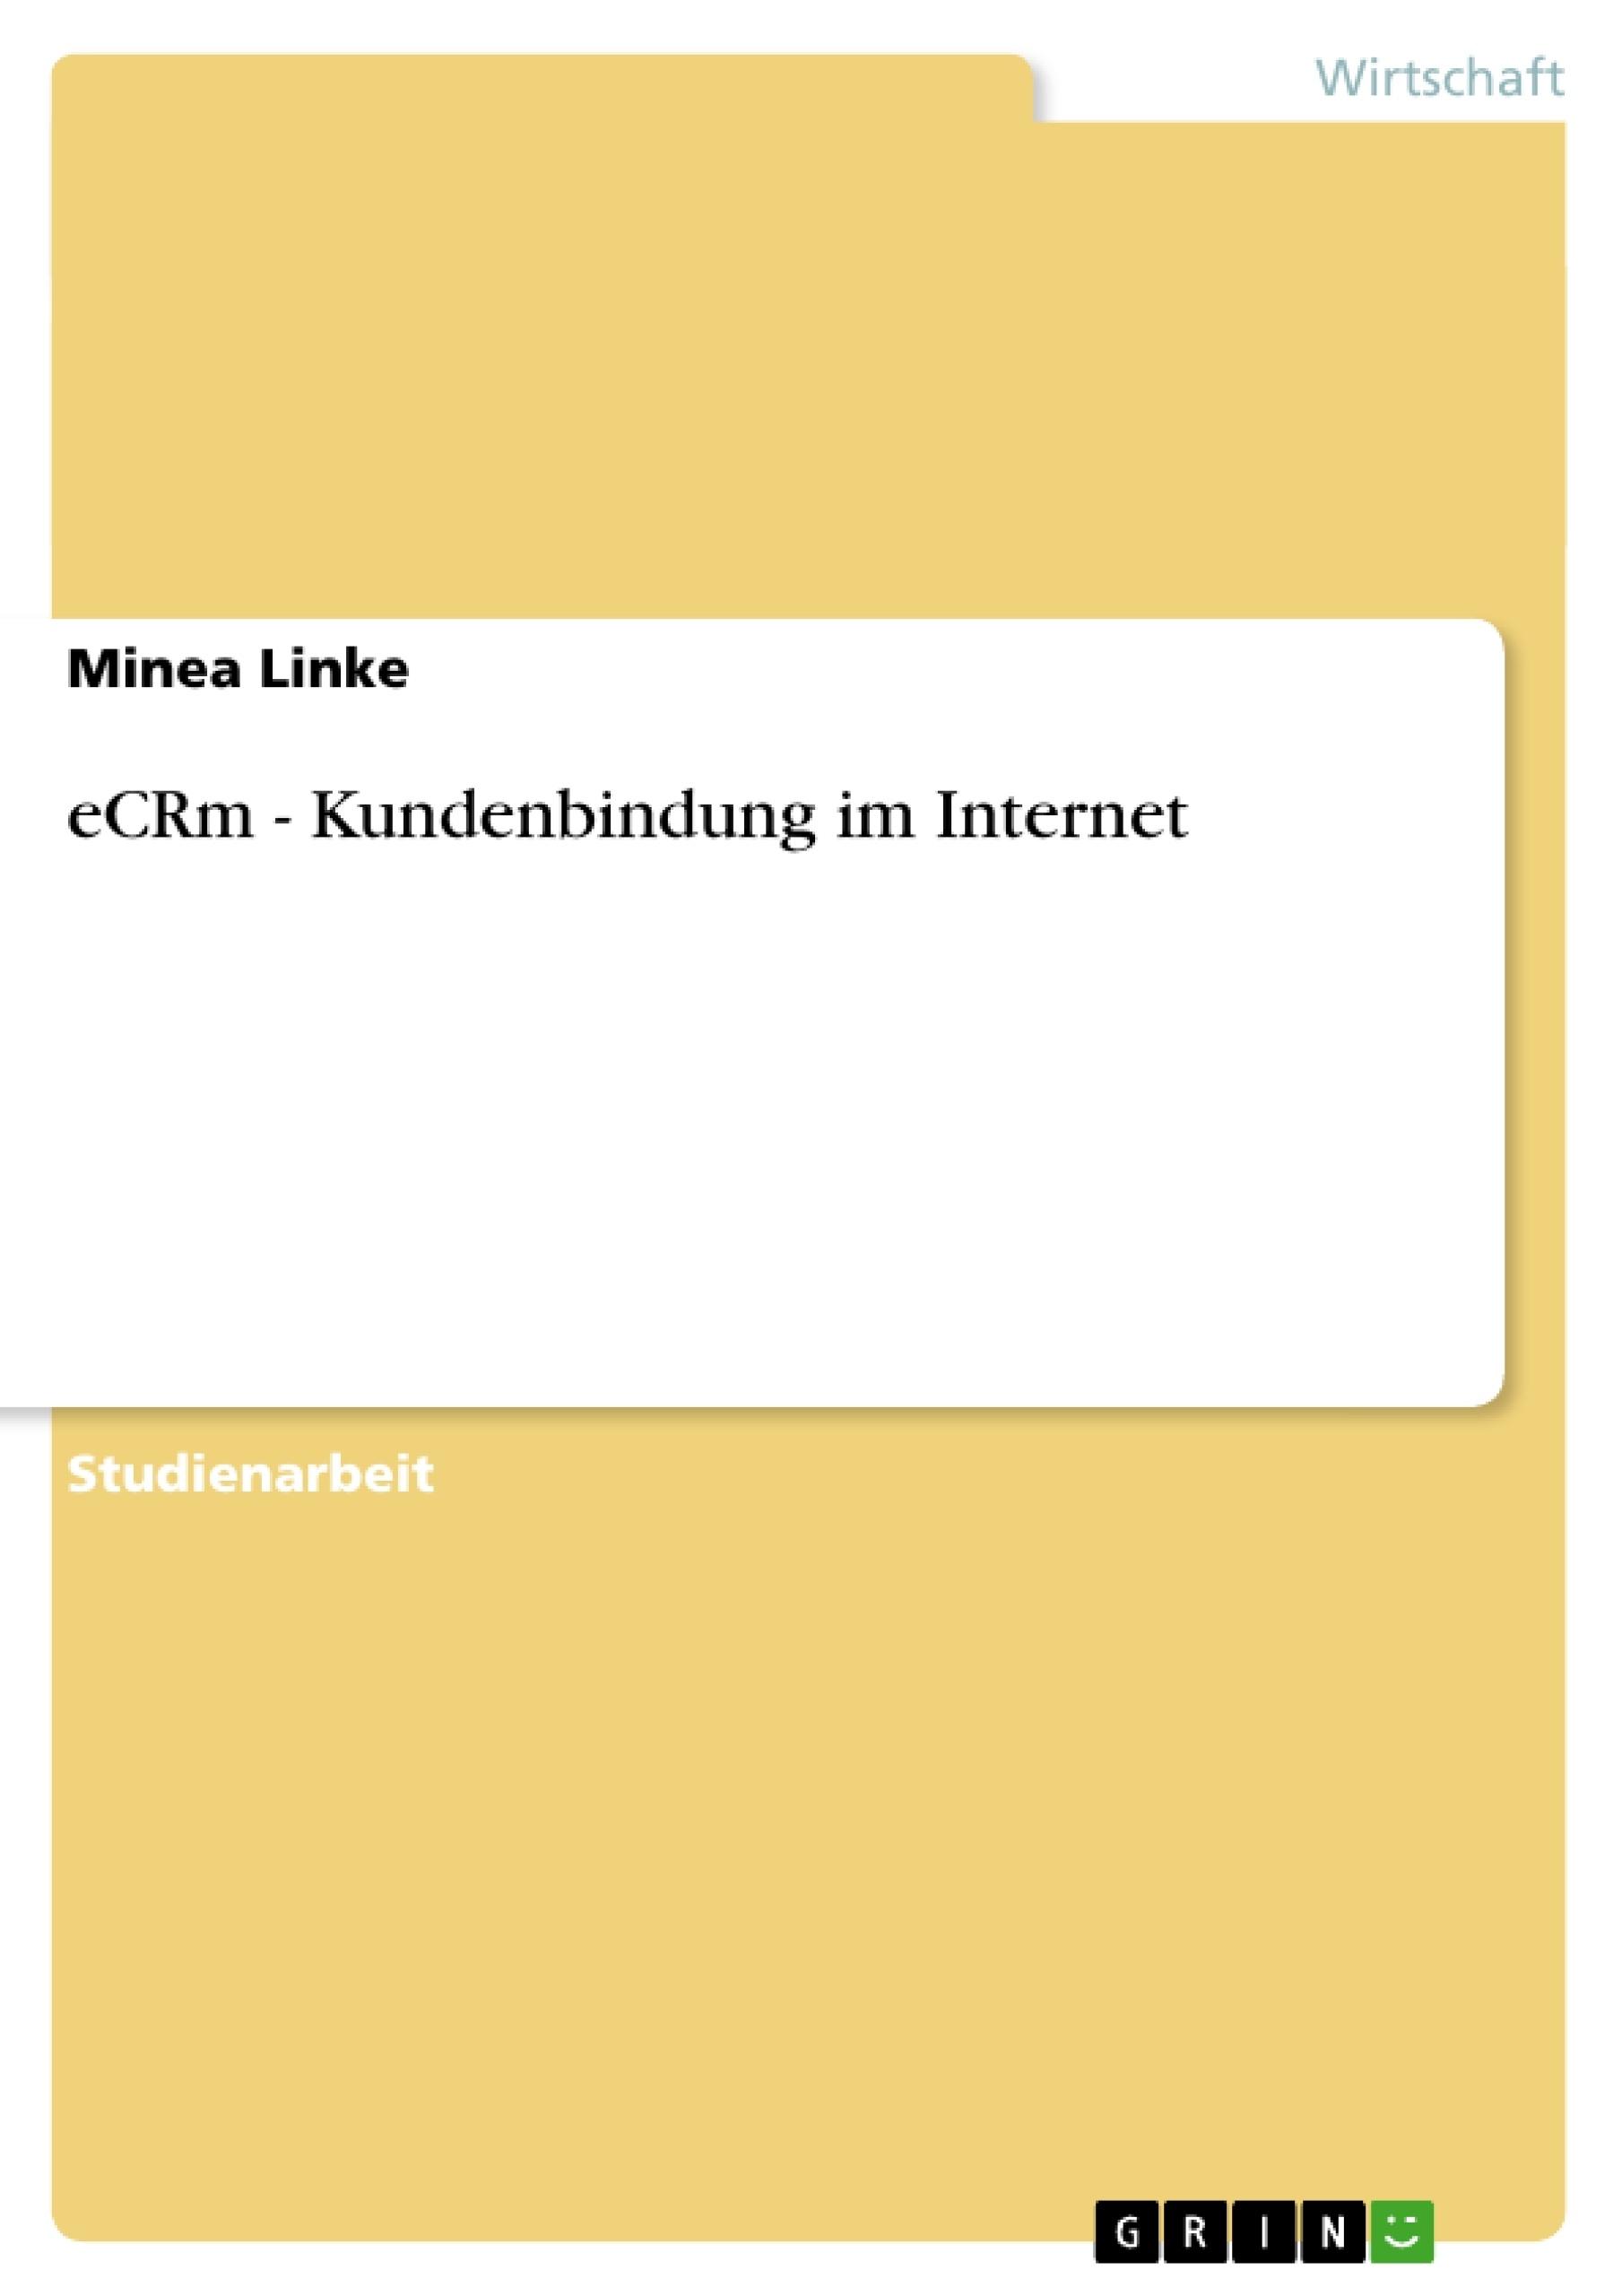 Titel: eCRm - Kundenbindung im Internet